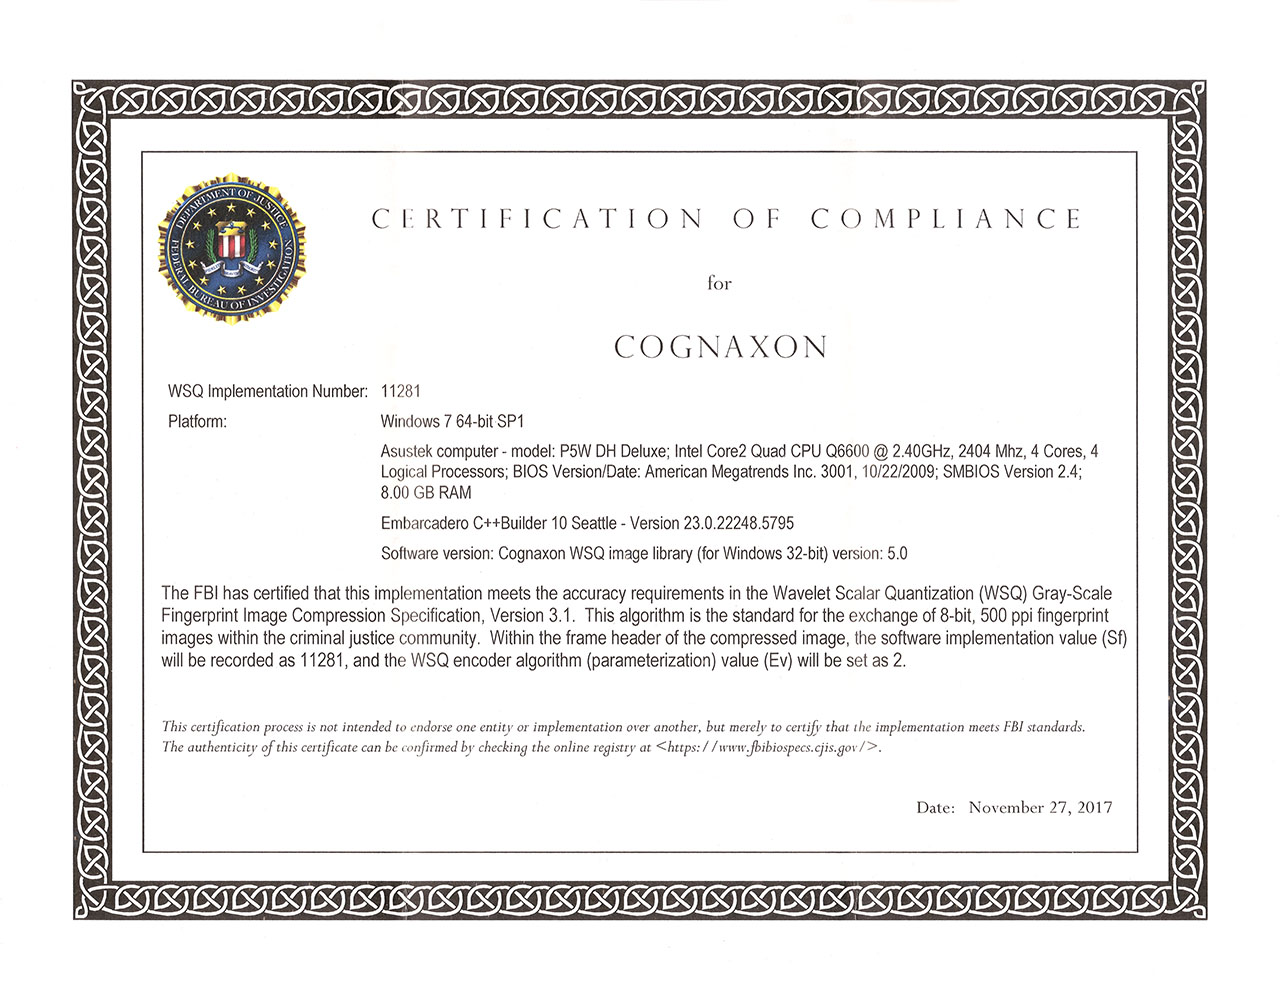 Cognaxon - Downloads - WSQ Image Library